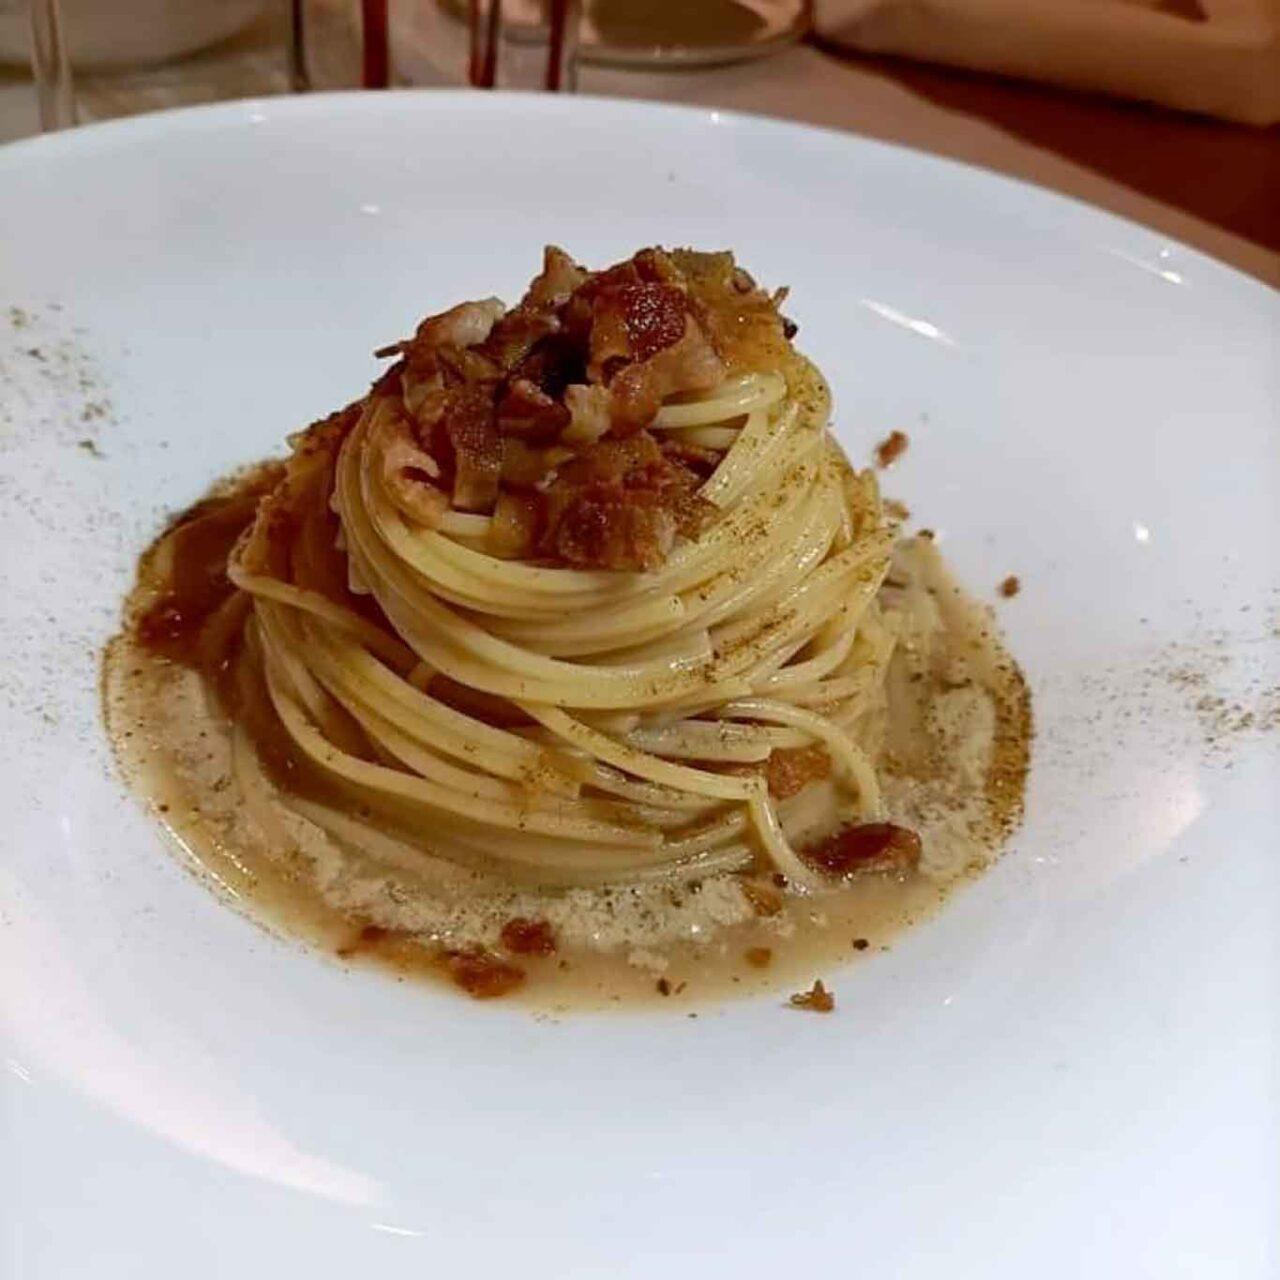 spaghettini all'amatriciana con funghi porcini